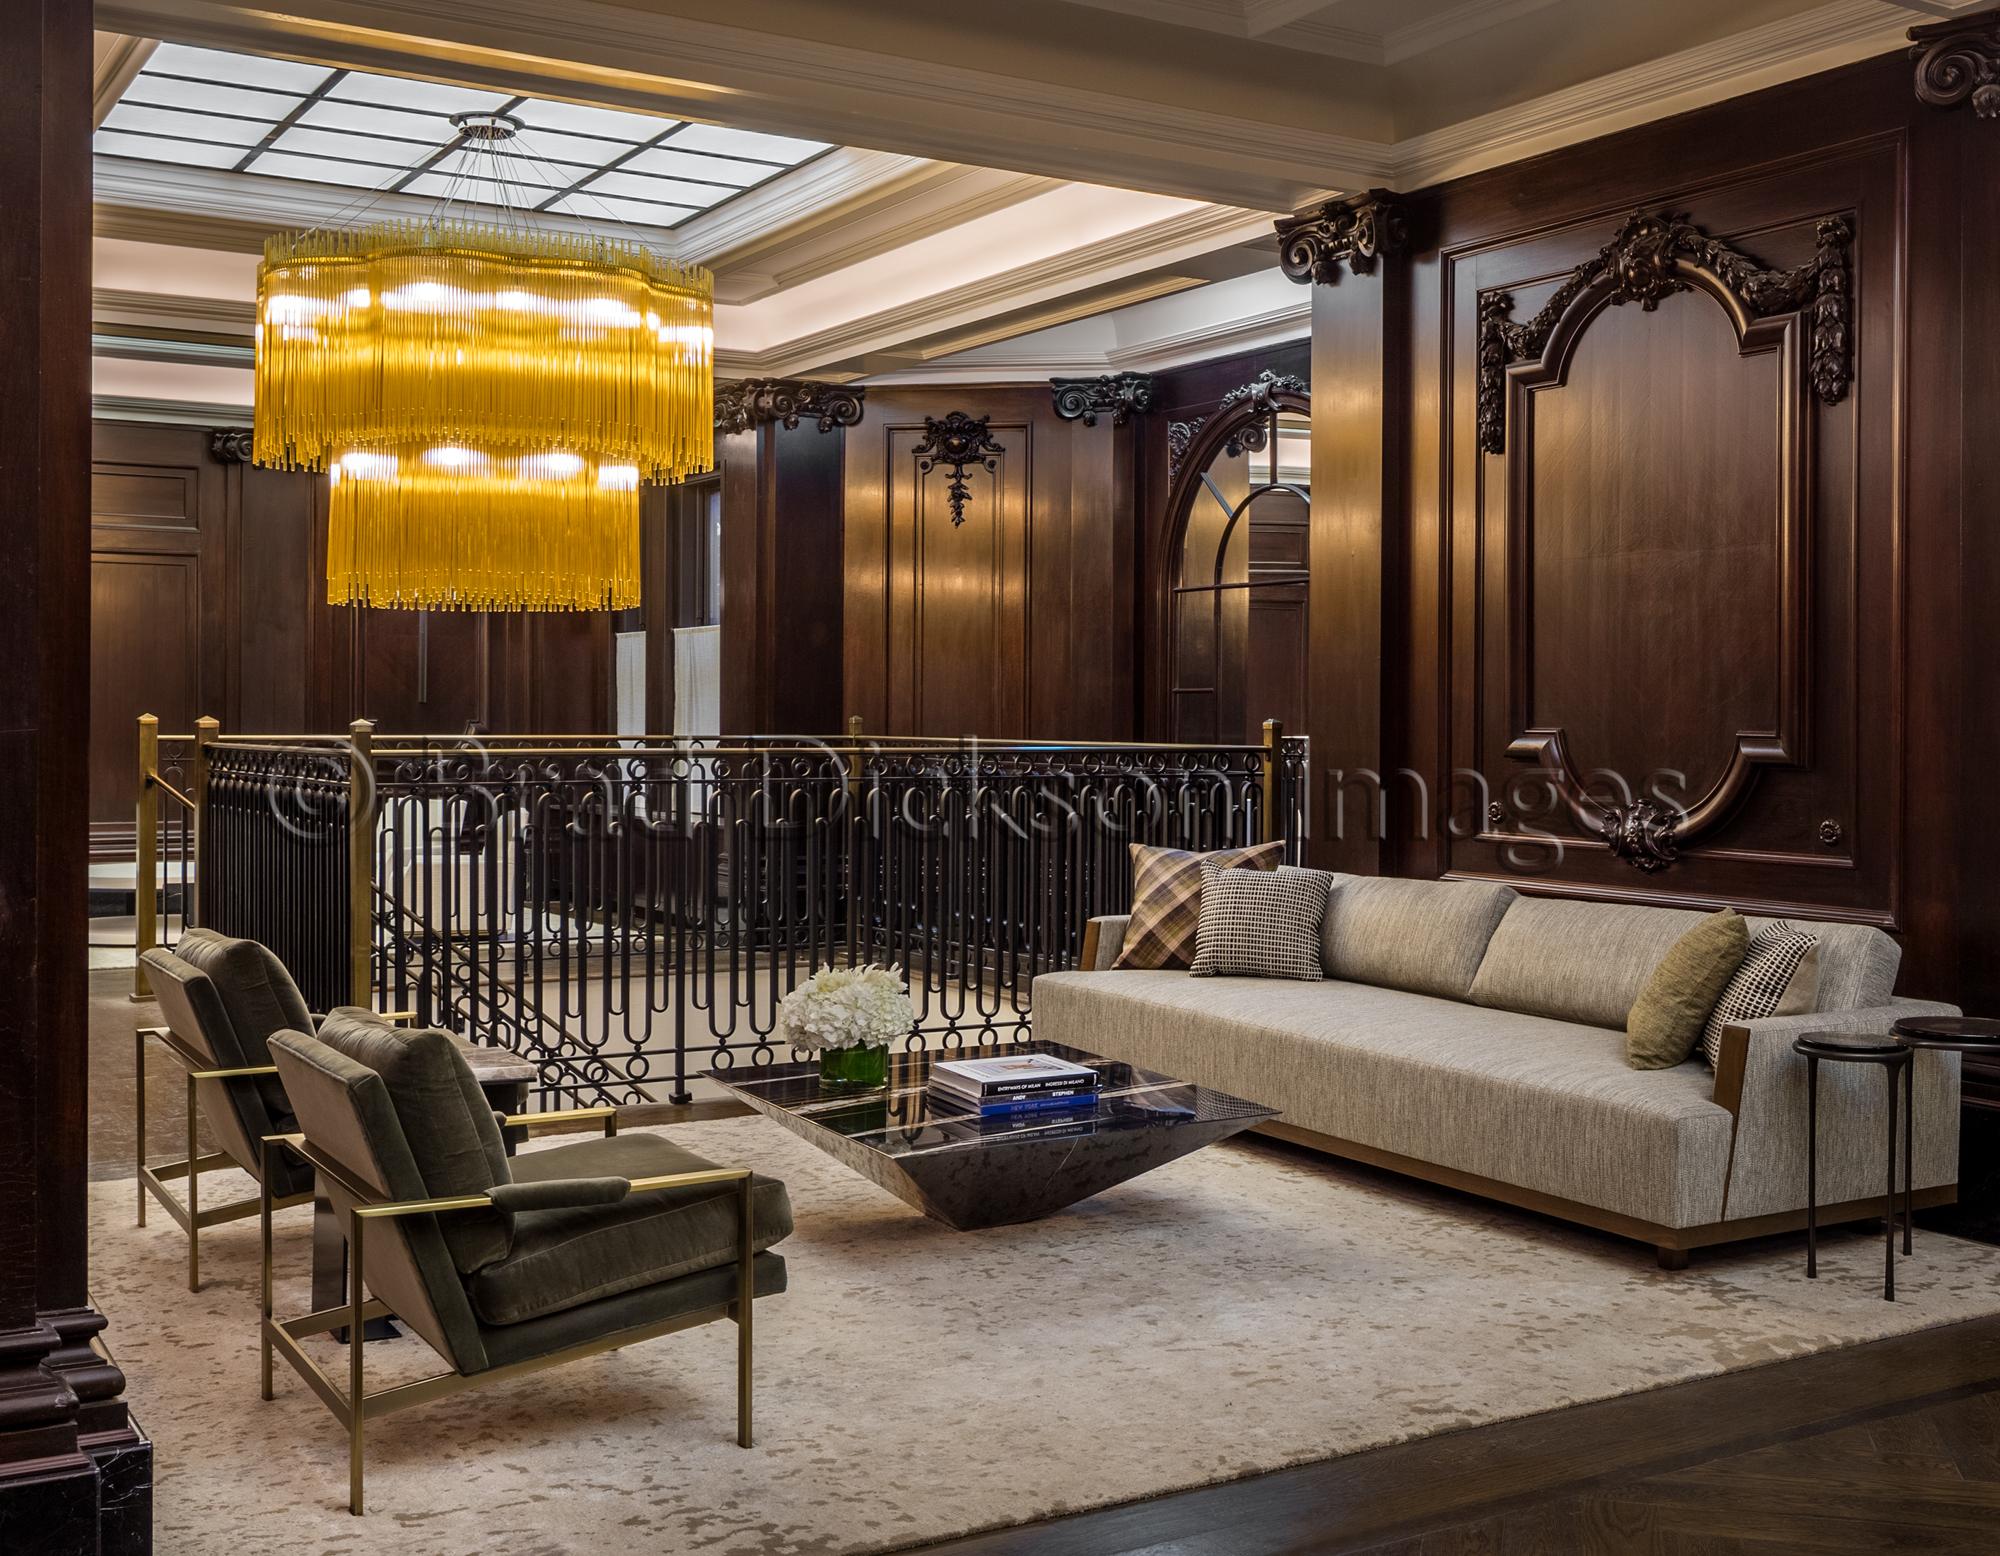 Chatsworth lobby 2